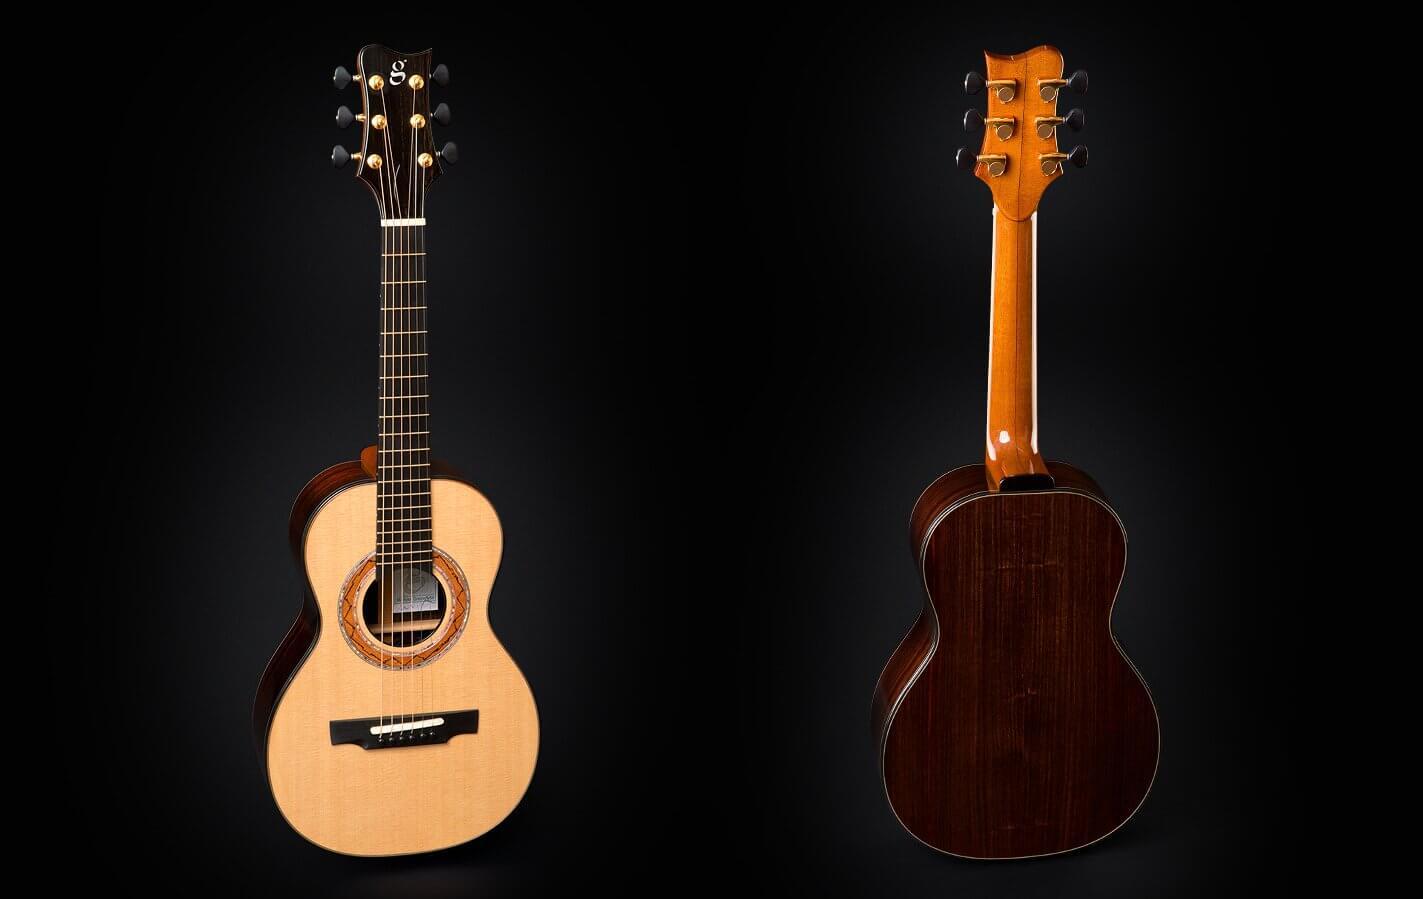 Greenfield Guitars | Fine handmade Acoustic Guitars Model G5, soprano guitar, Sitka spruce, east Indian rosewood